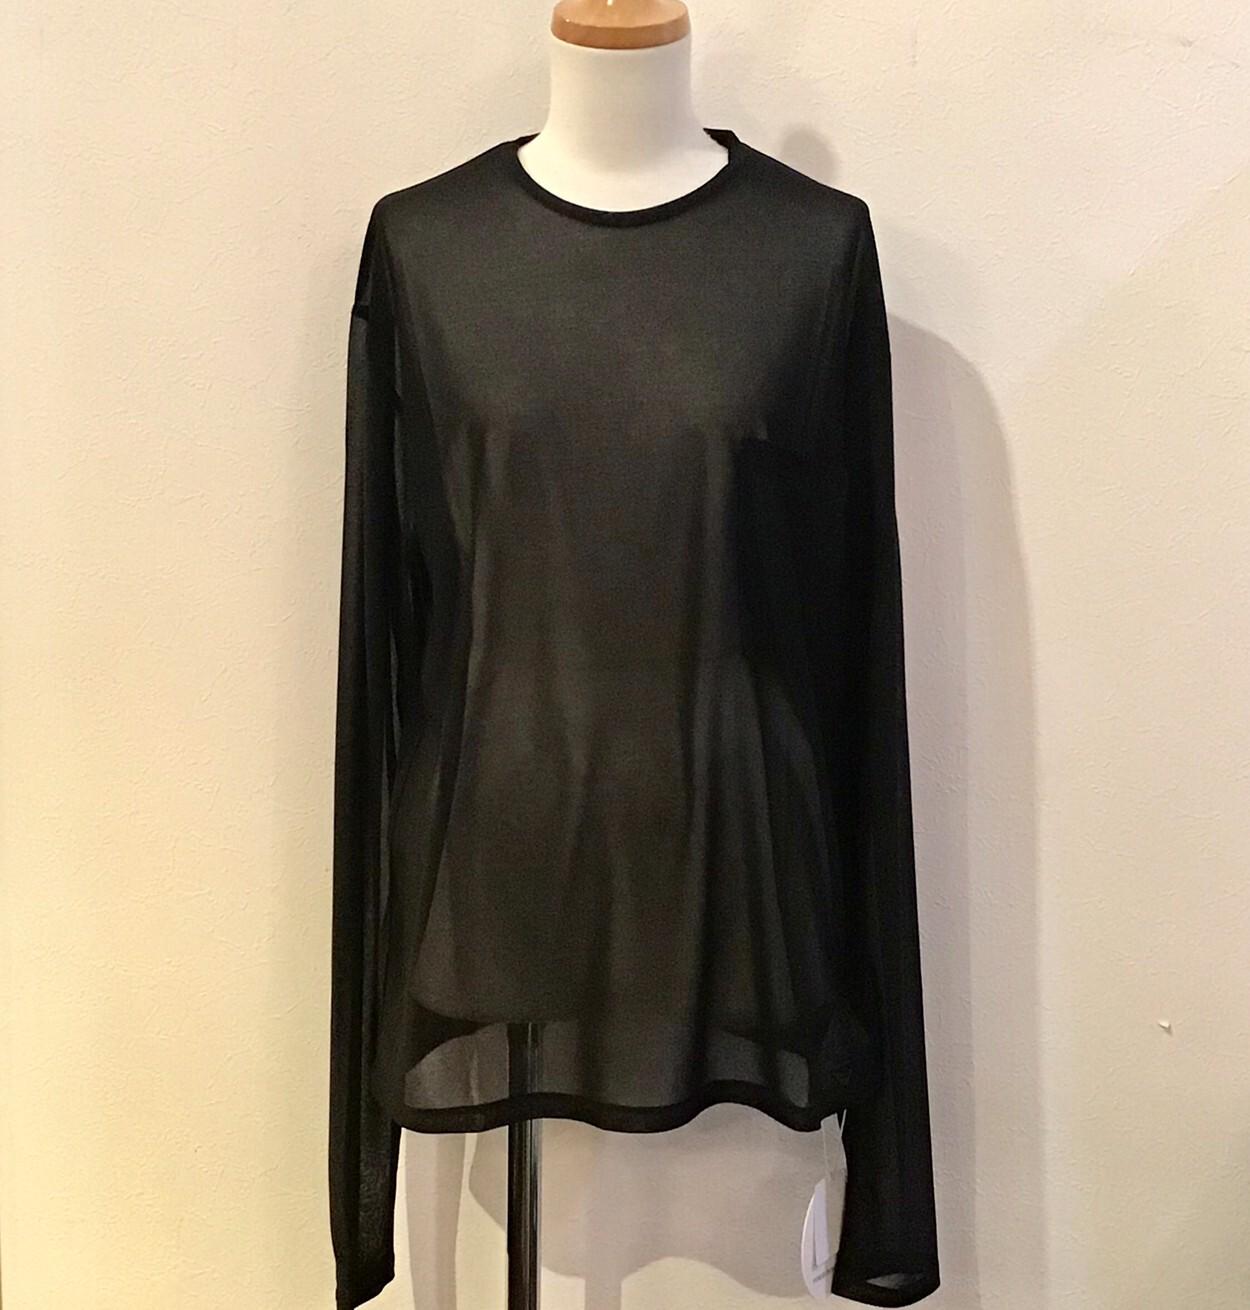 FUMIETANAKA F20A-35 print through long tshirts color black